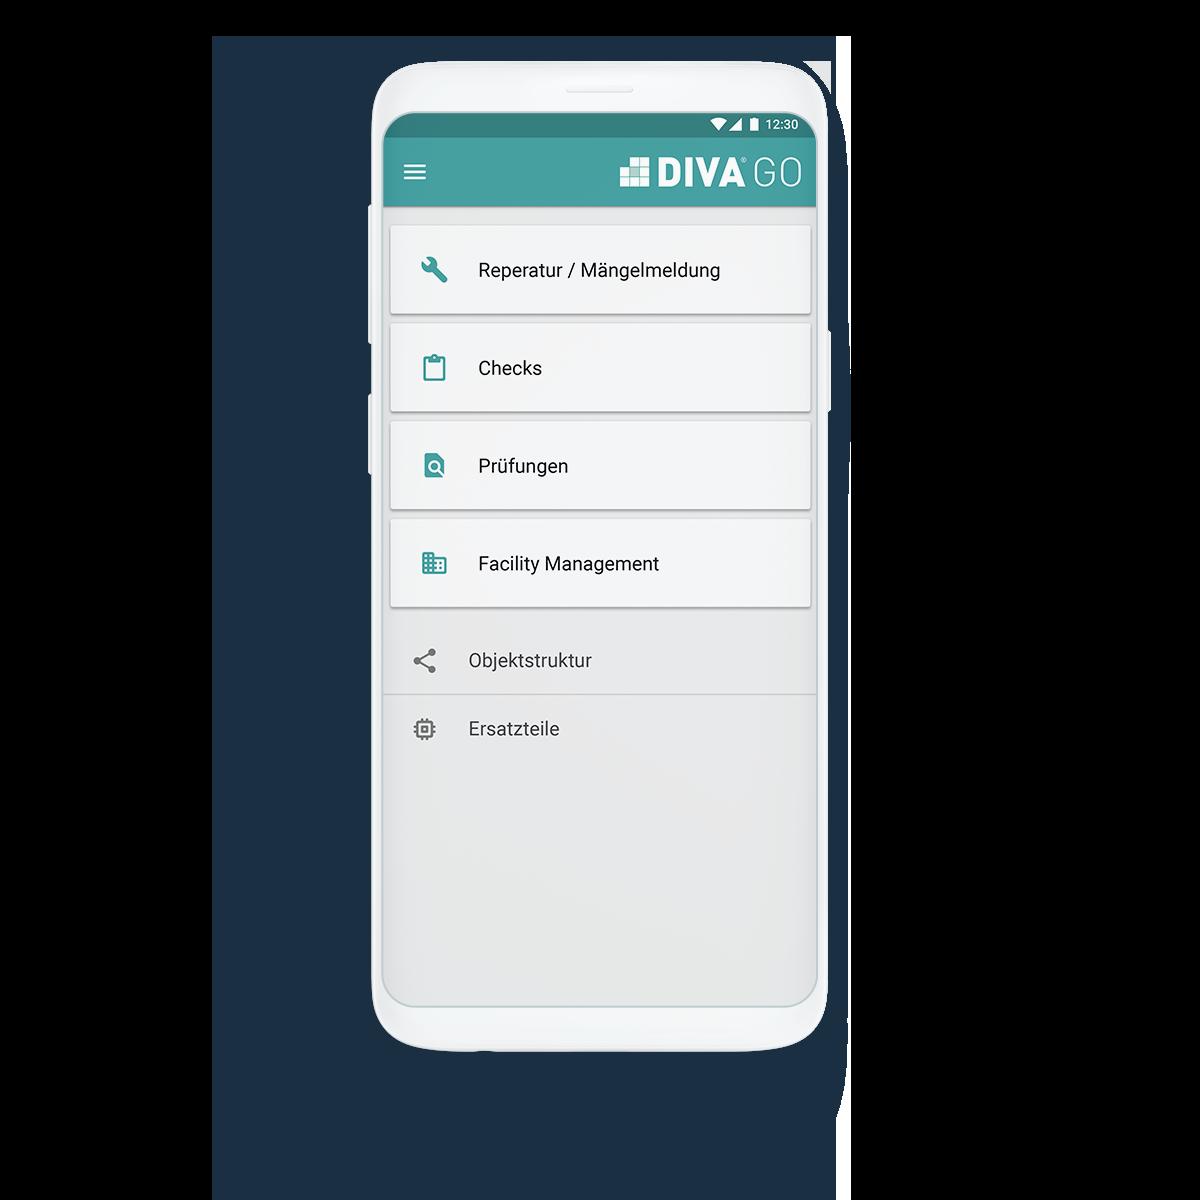 DIVA GO App im Smartphone geöffnet